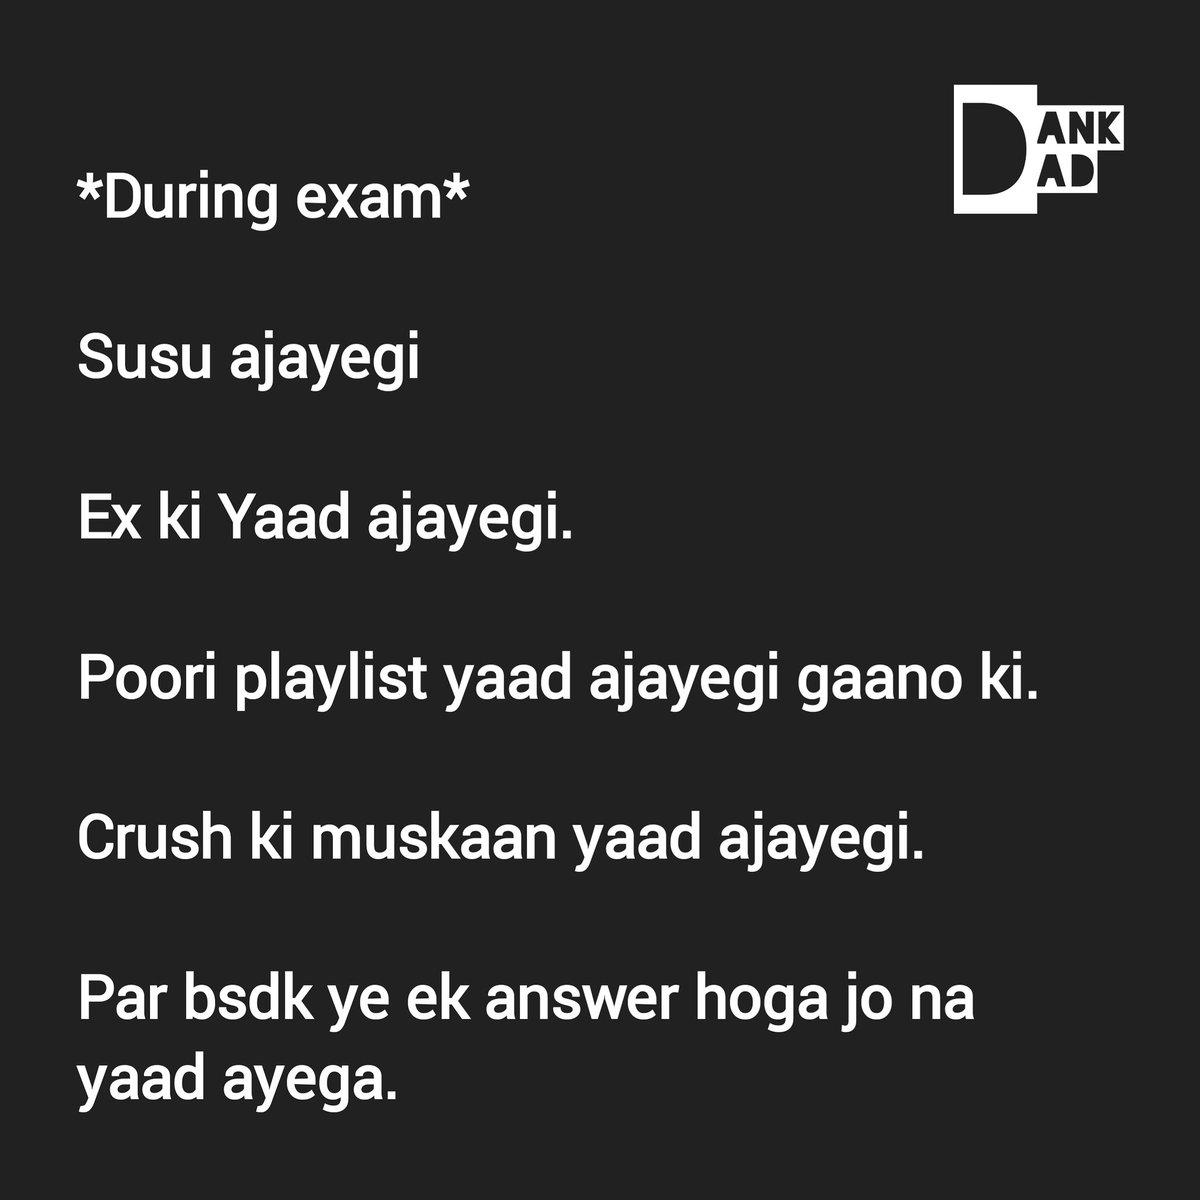 Follow @_dank_dad_ for more ....#fun #jokeoftheday #laugh  #dankjokes #nonvegjokes #follow #funny #jokes #sarcasm #FF #likes #comedyindia #backchodi #sacredmemes #bollywoodpic.twitter.com/GGKQddurzf